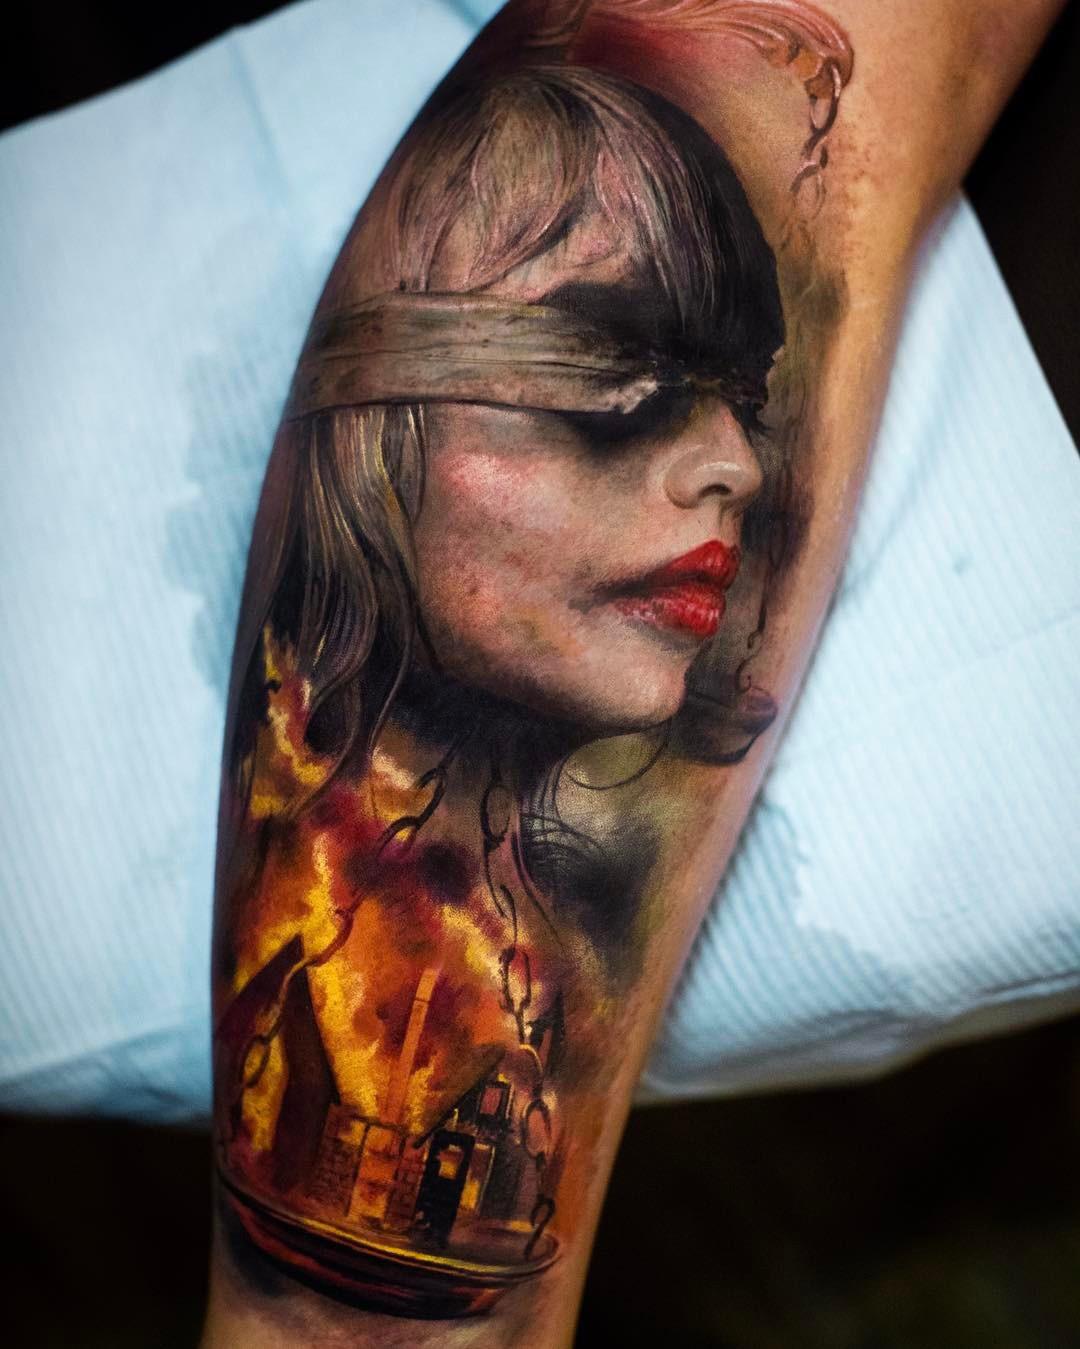 Lady justice tattoo best tattoo design ideas for Best tattoo artists in nyc 2017